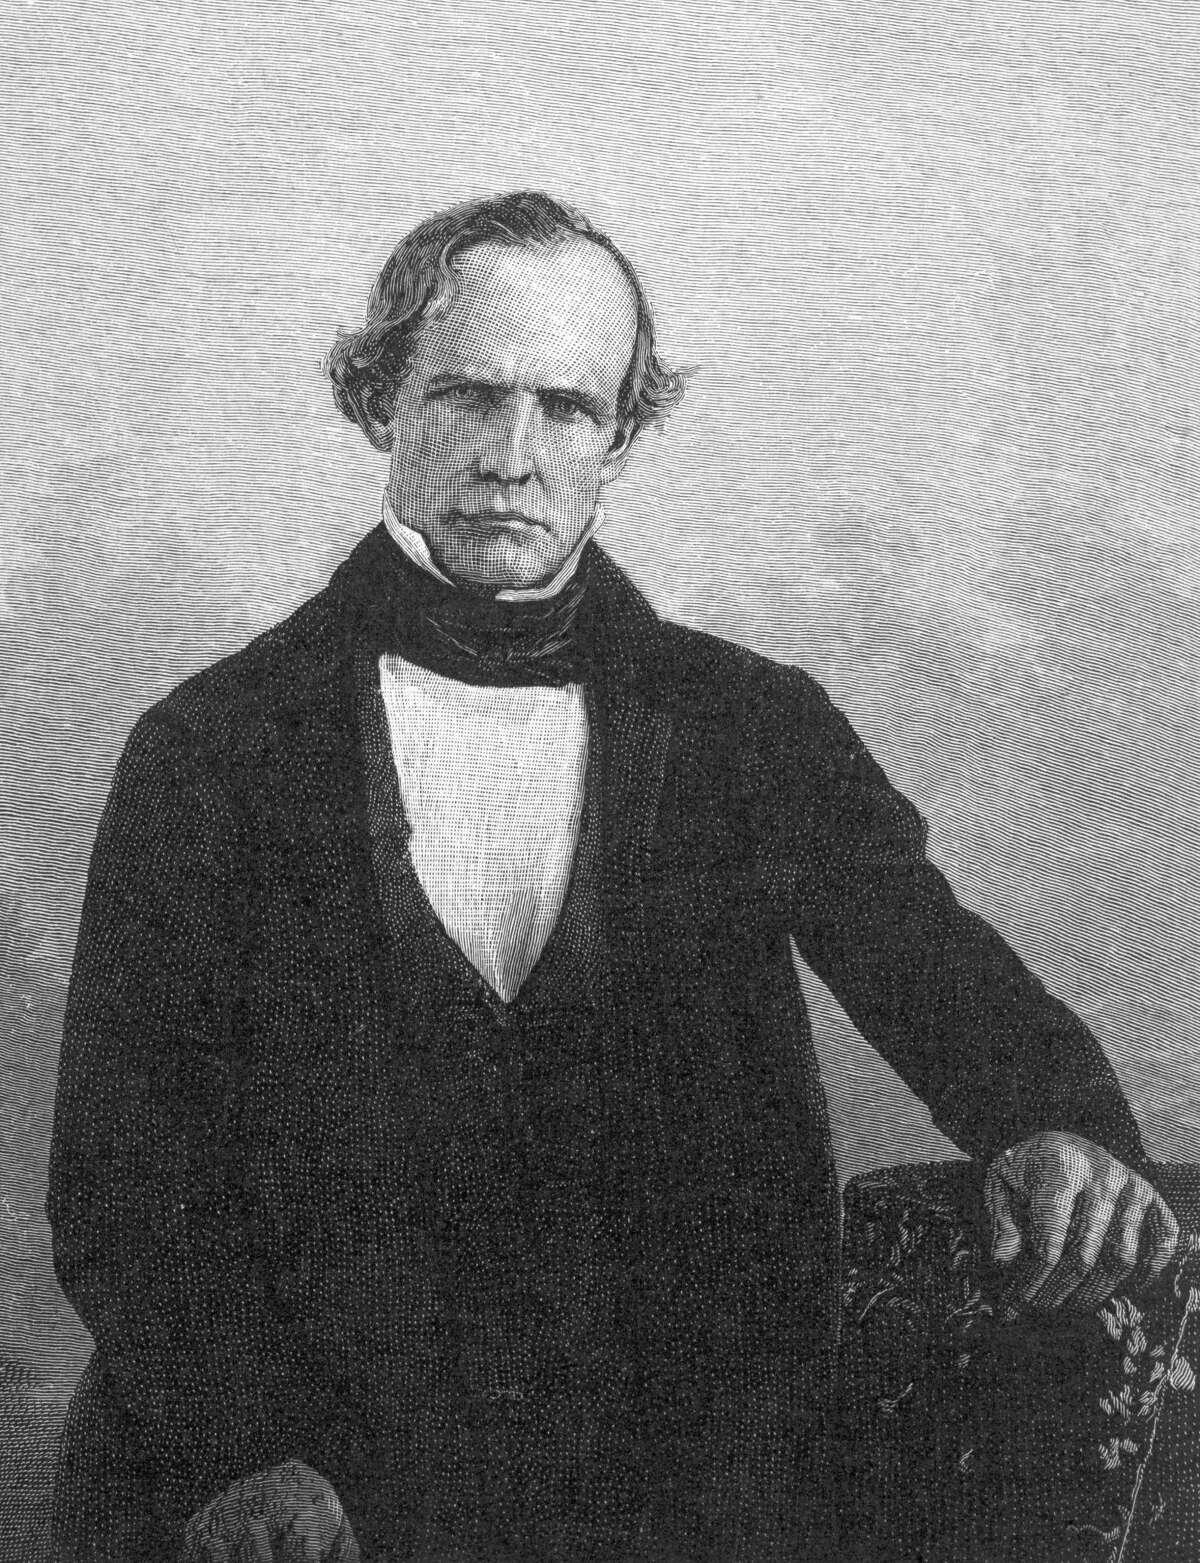 Peter H. Burnett, first Governor of California.